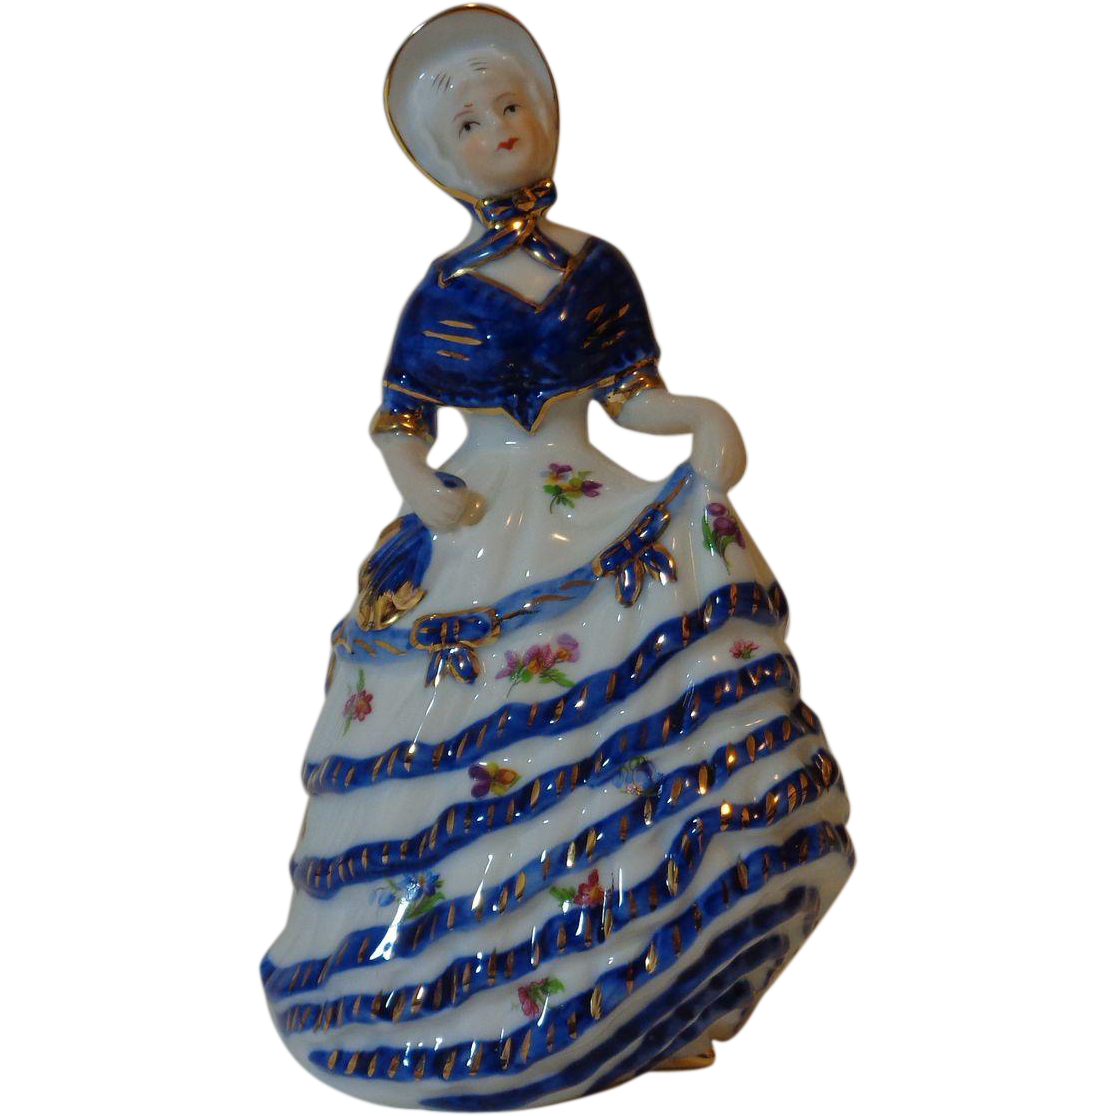 KPM Porcelain Victorian Woman Figurine